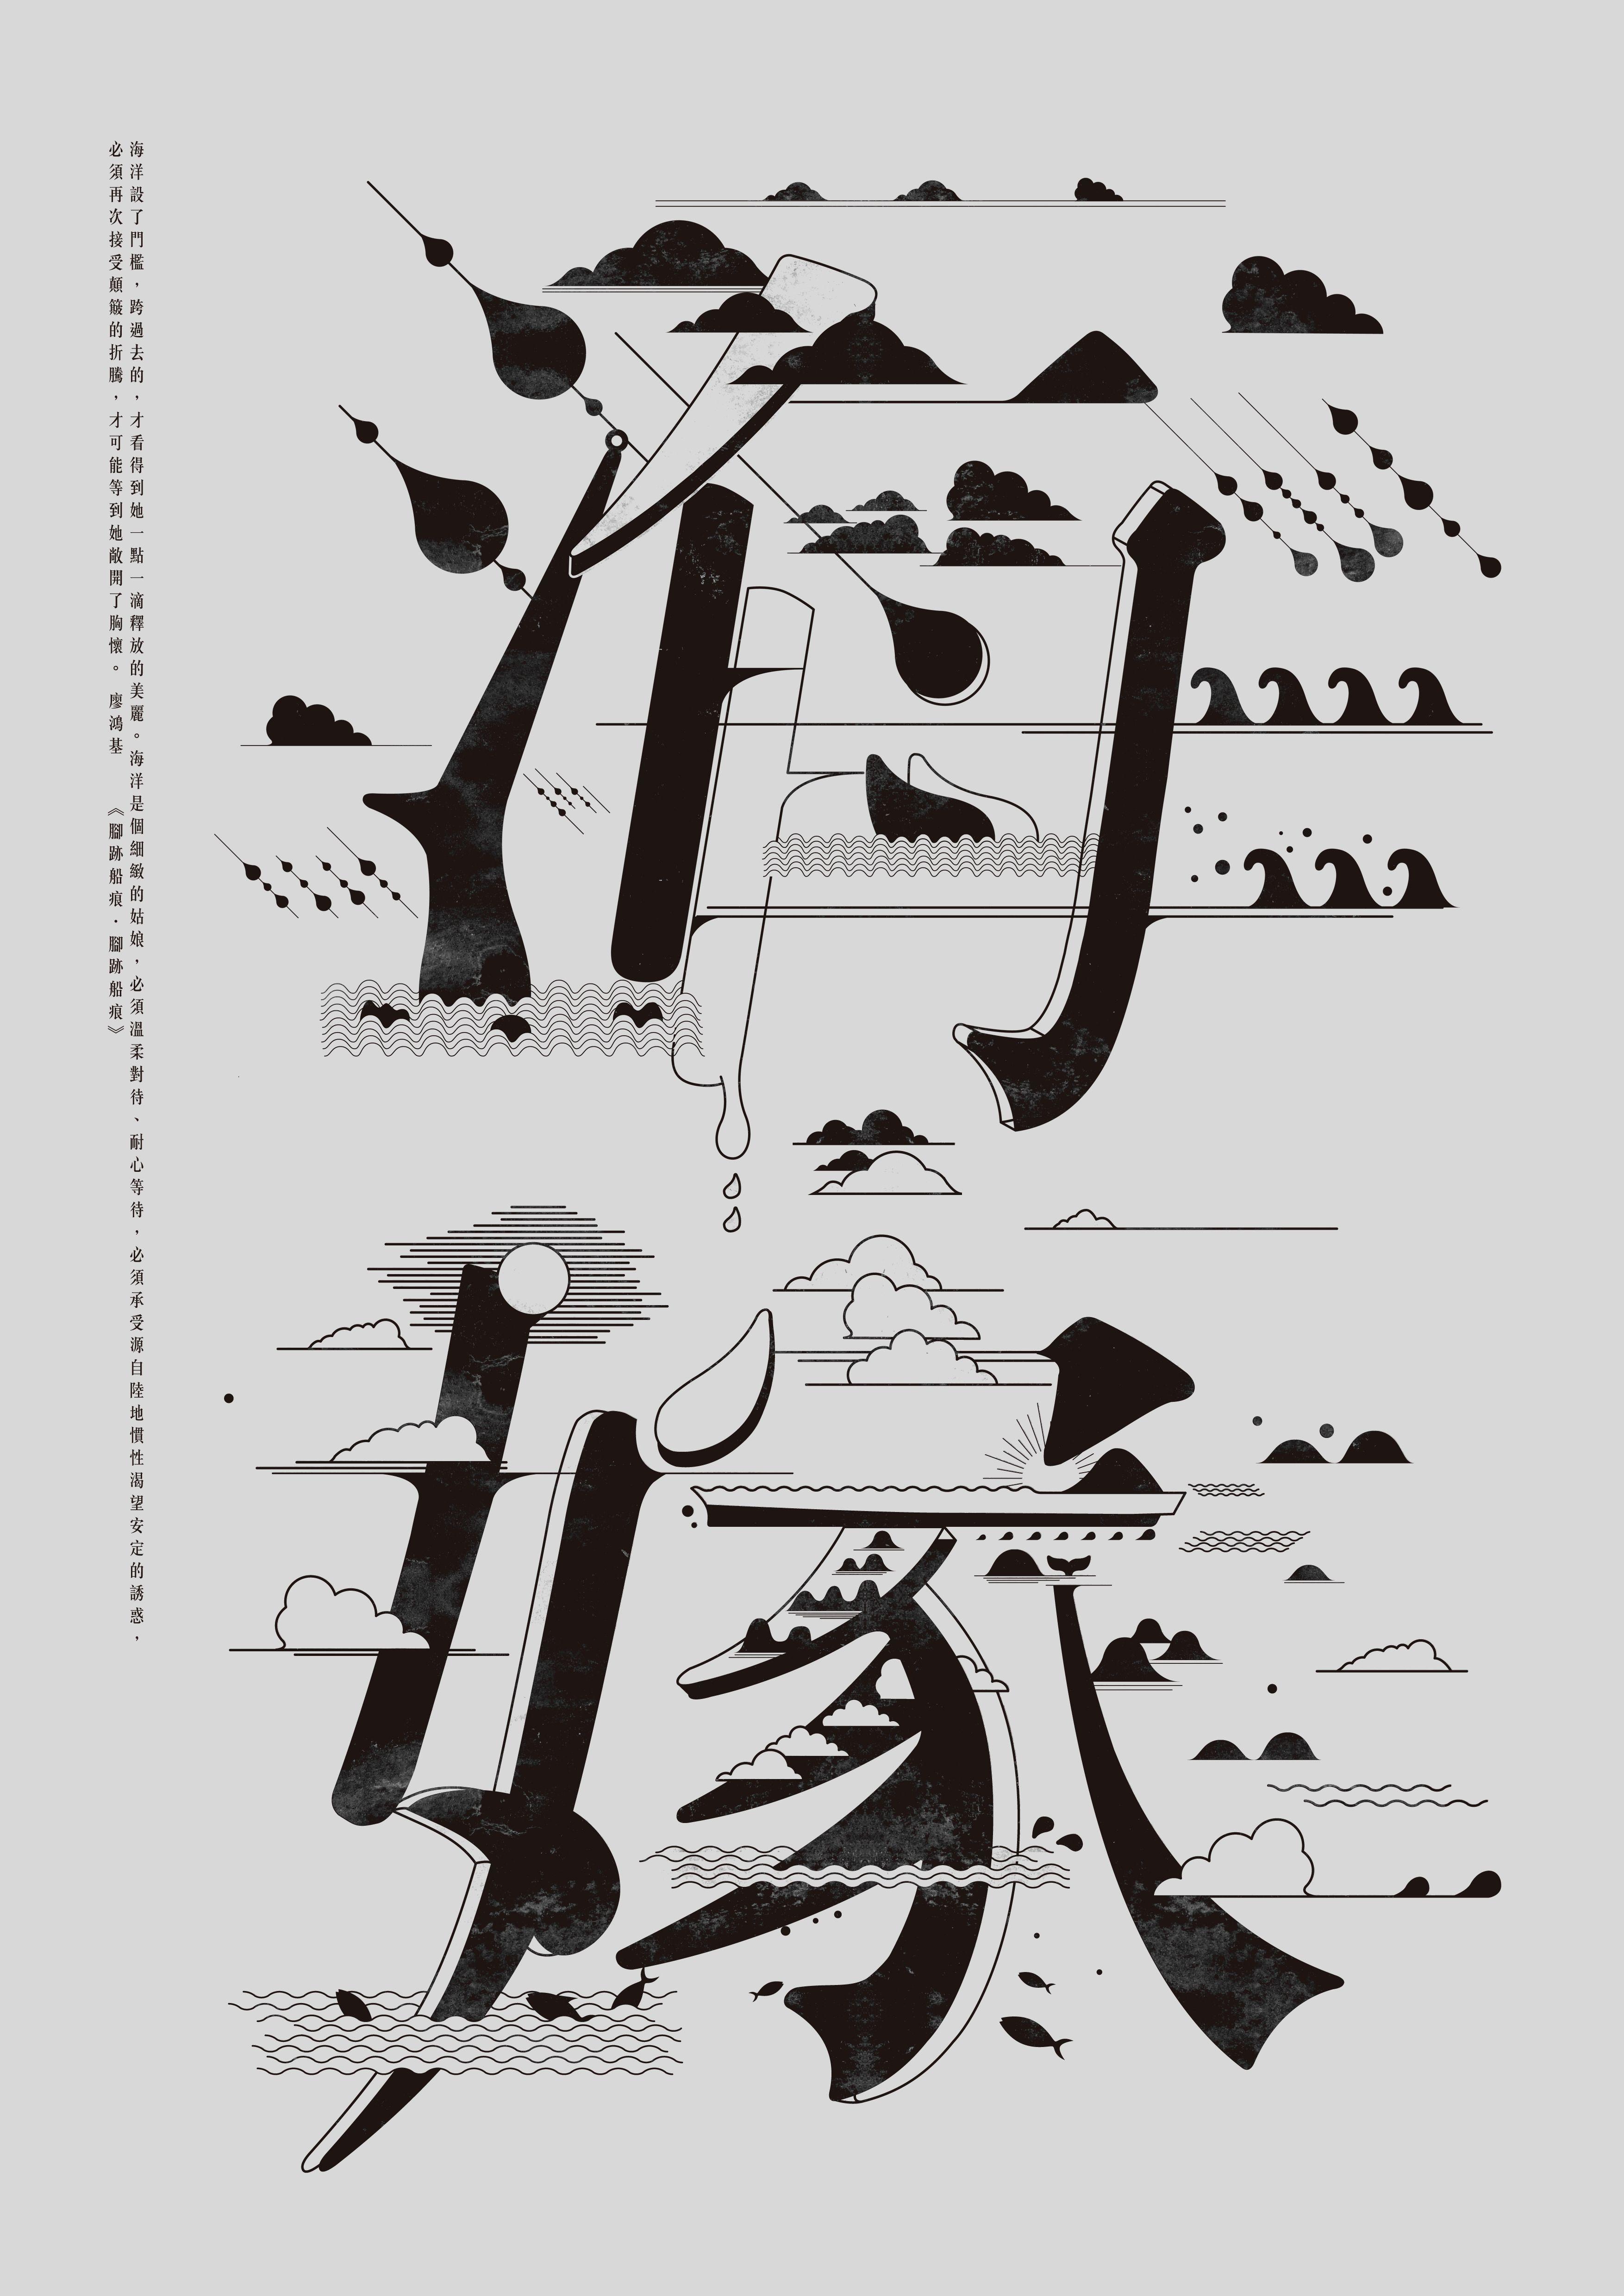 Sea Man タイポグラフィーデザイン レタリングデザイン テキストデザイン